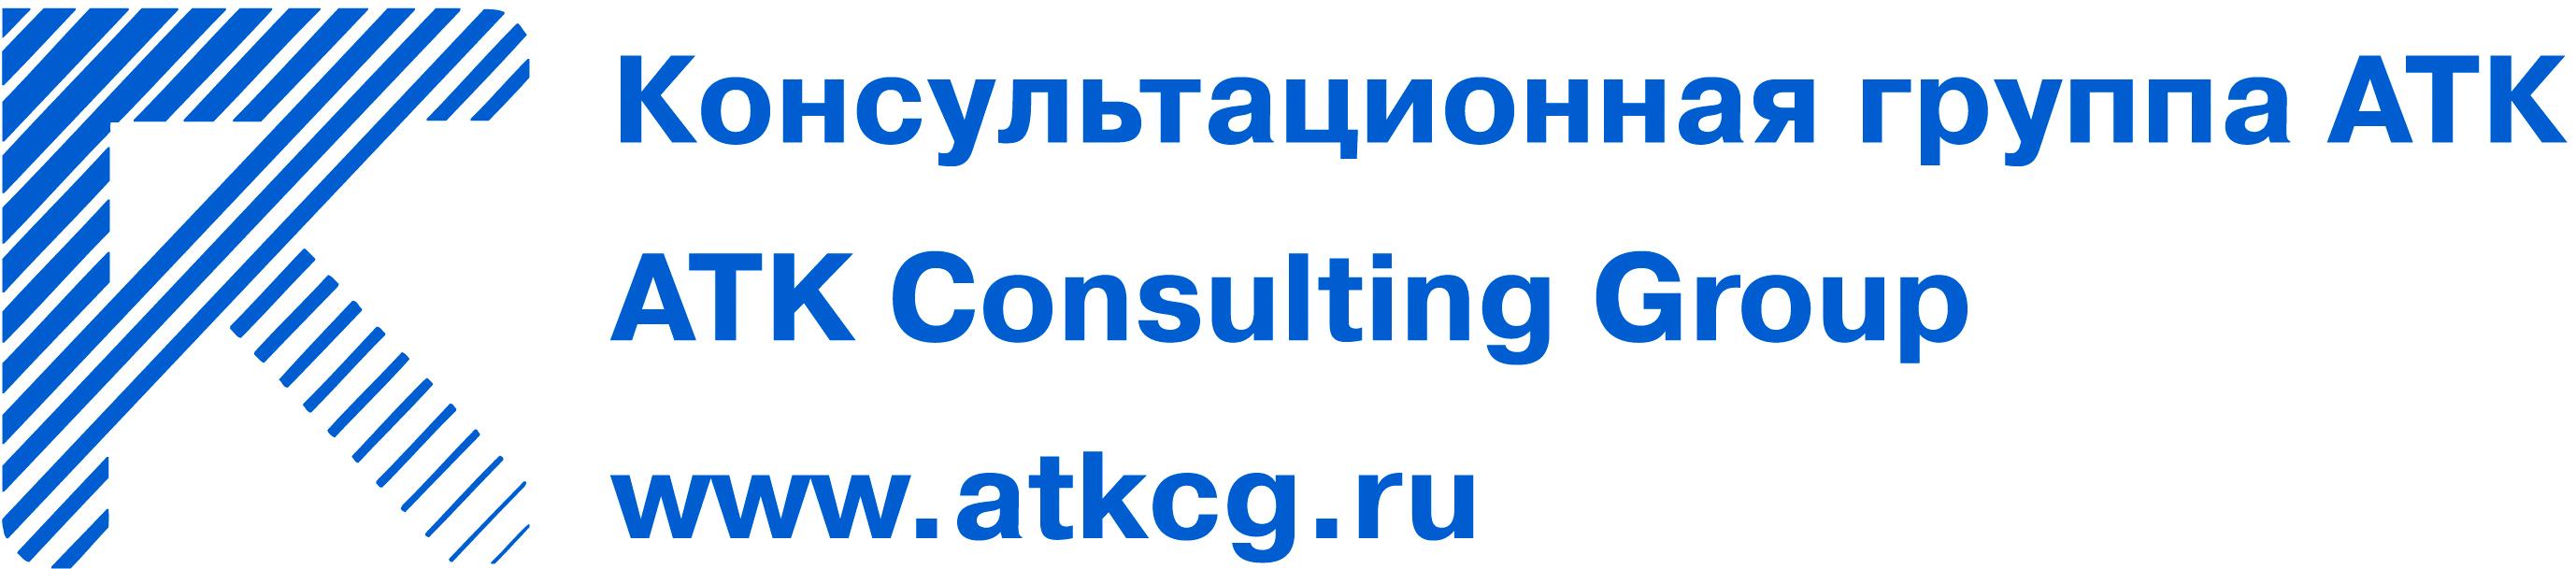 Консультационная Группа АТК